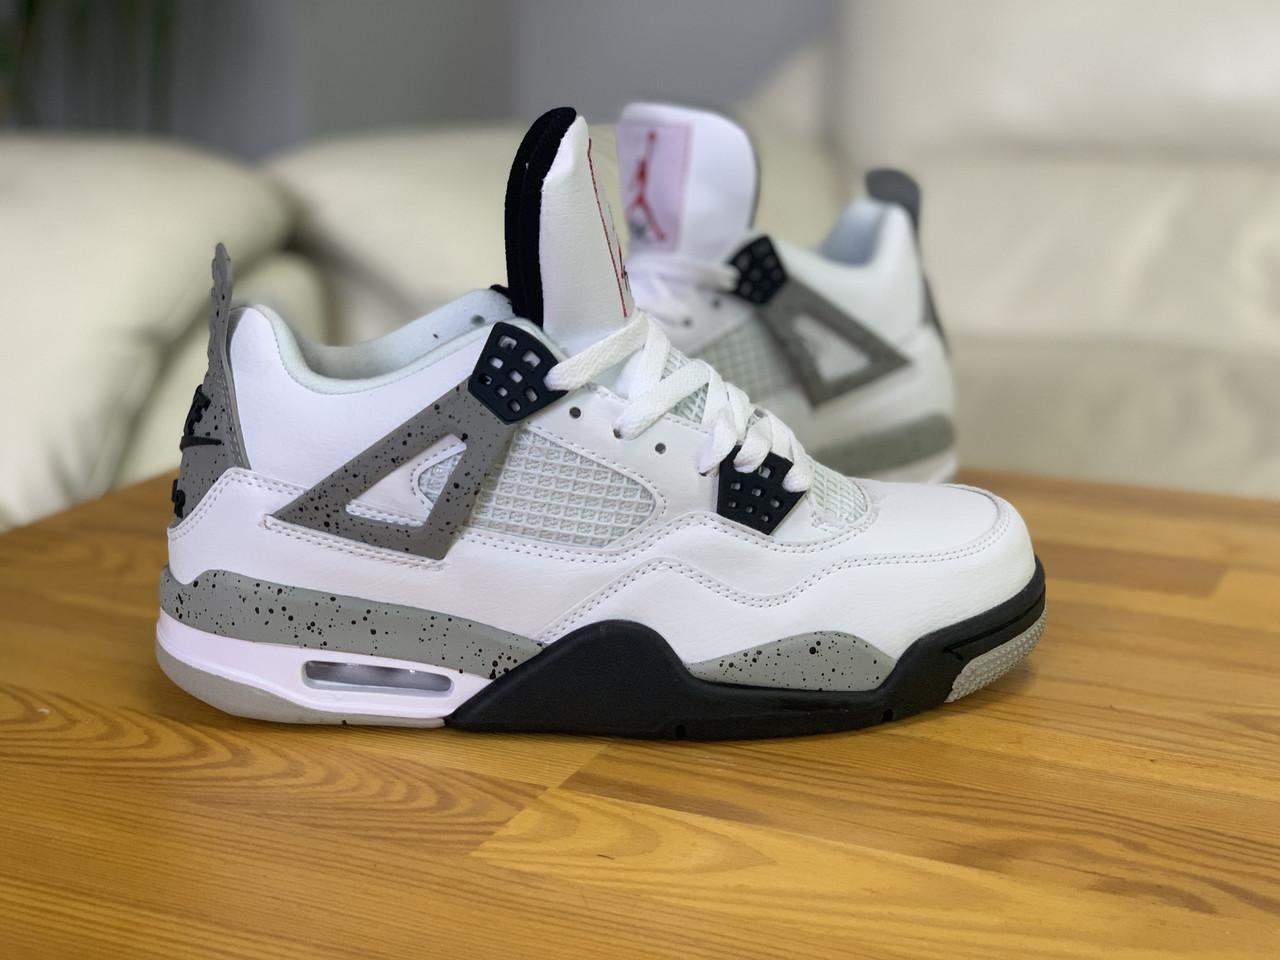 Мужские белые кроссовки Nike Air jordan 4 Найк Аир Джордан 4